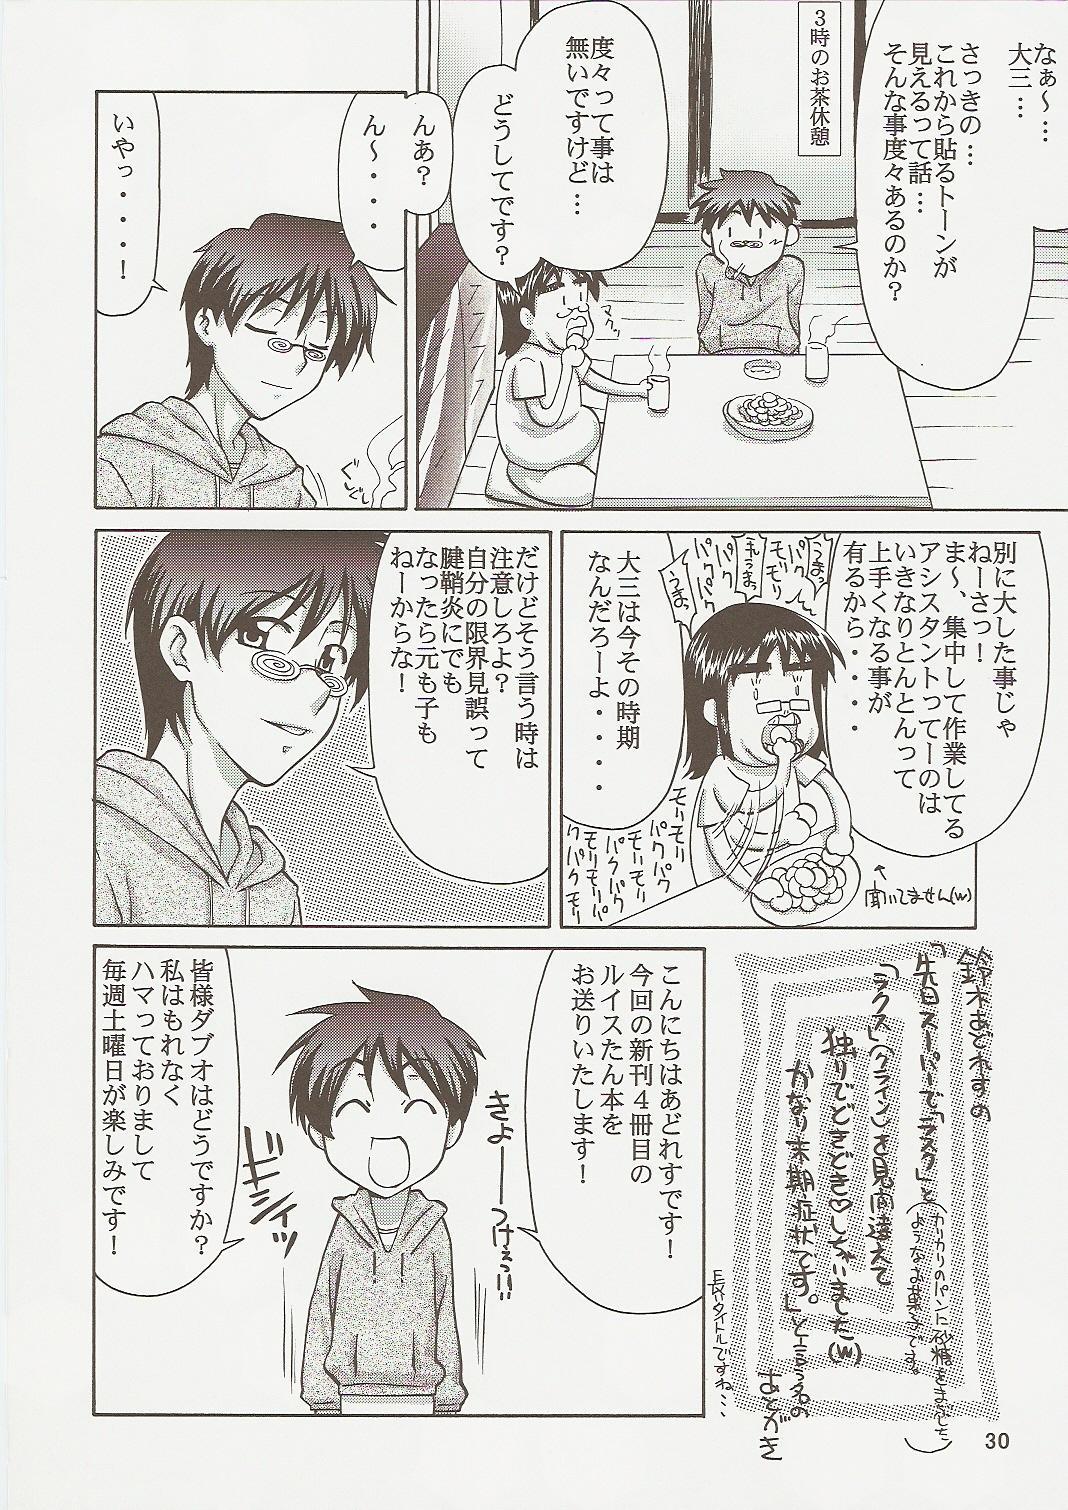 COMIC Daybreak Vol. 01 28